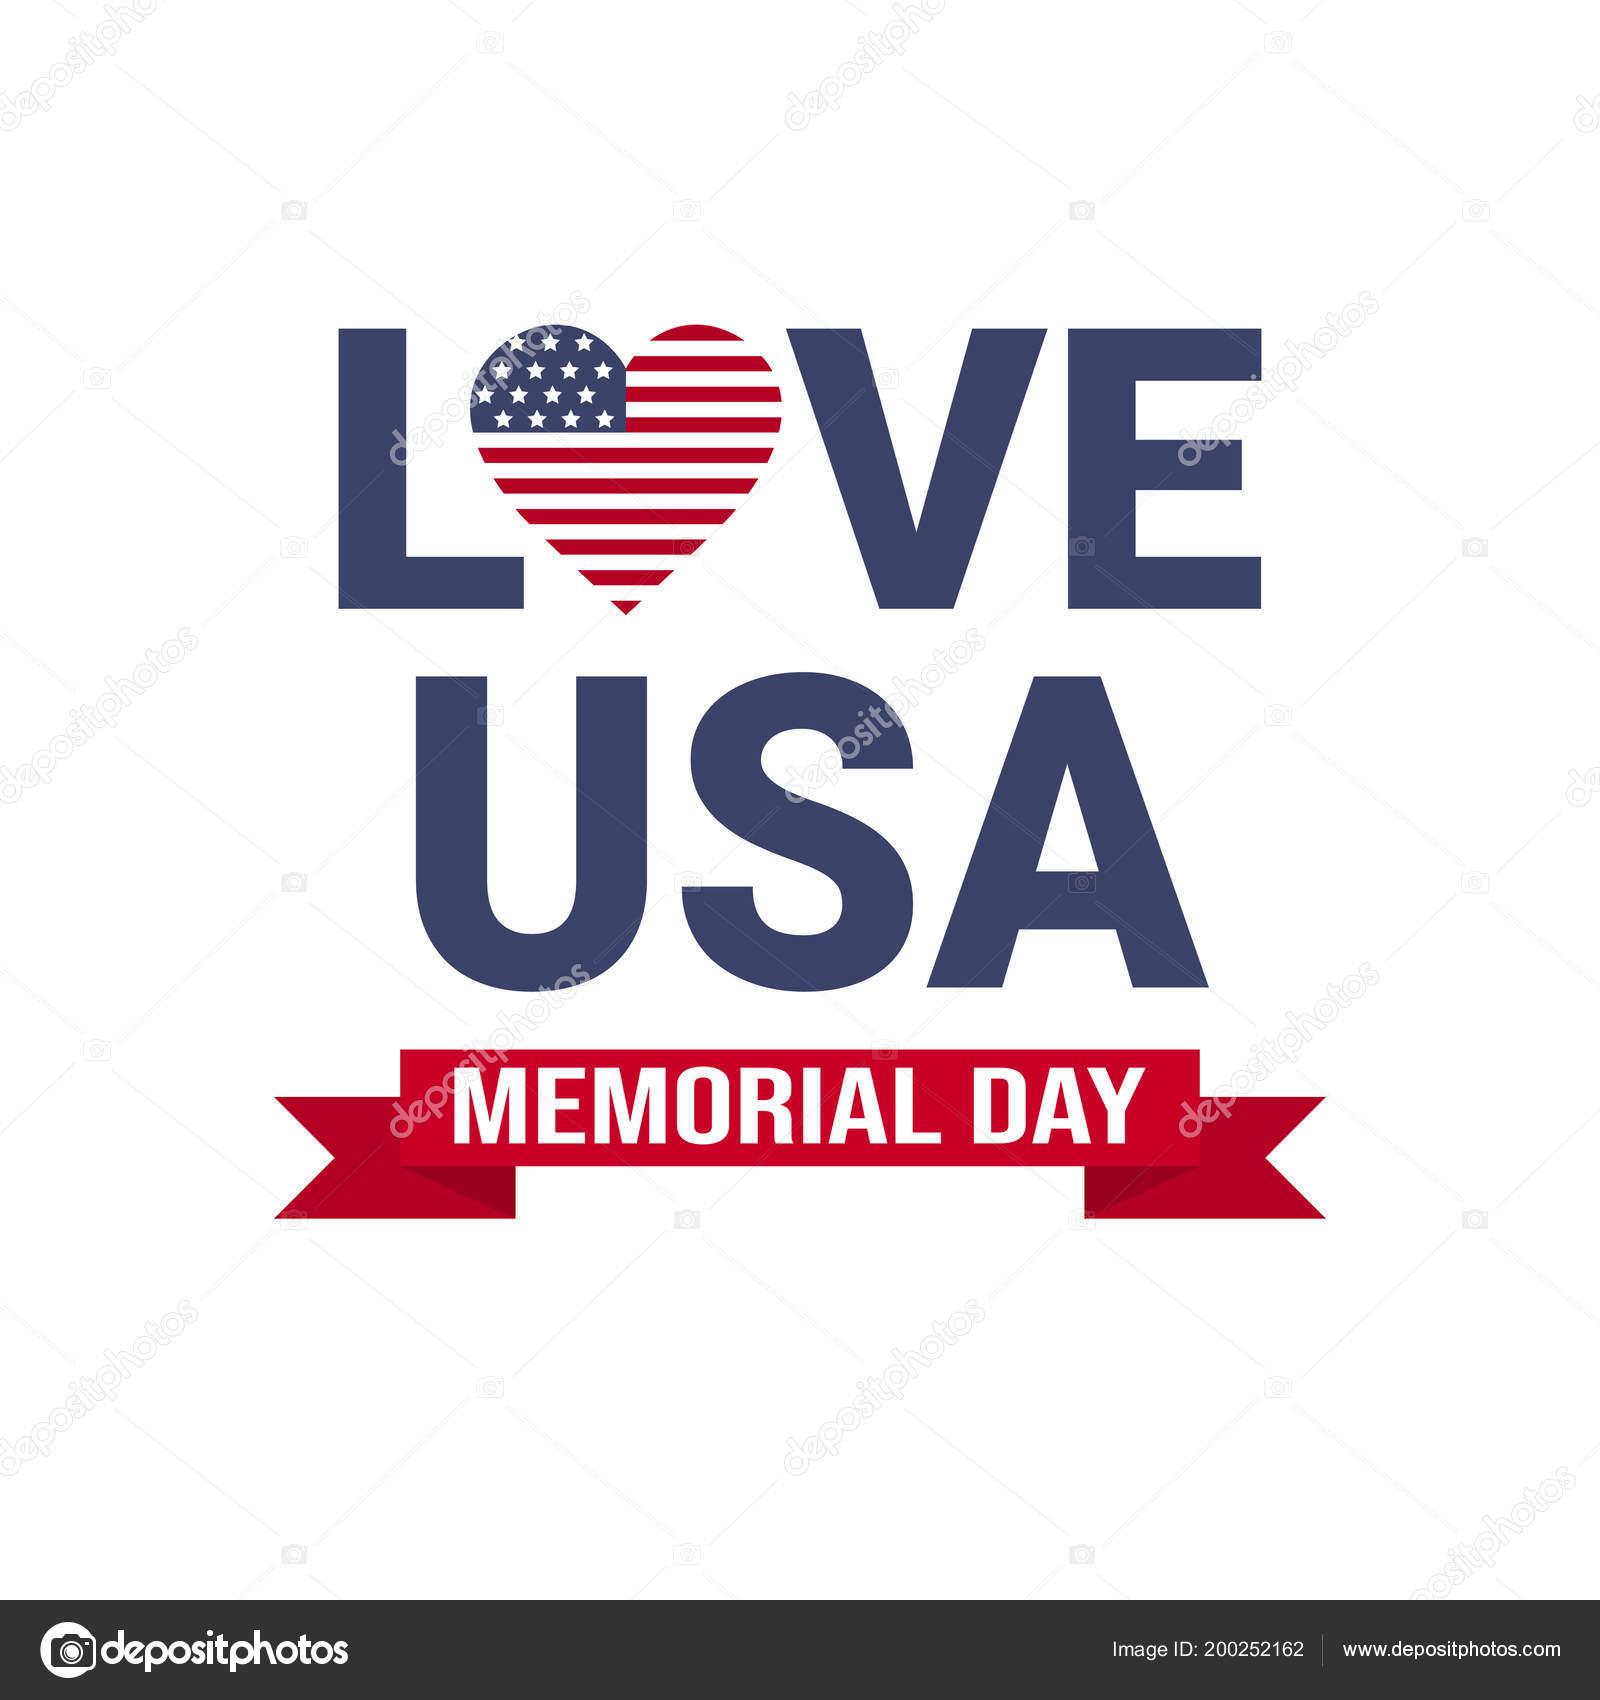 Memorial Day Usa Greeting Card Wallpaper National American Flag